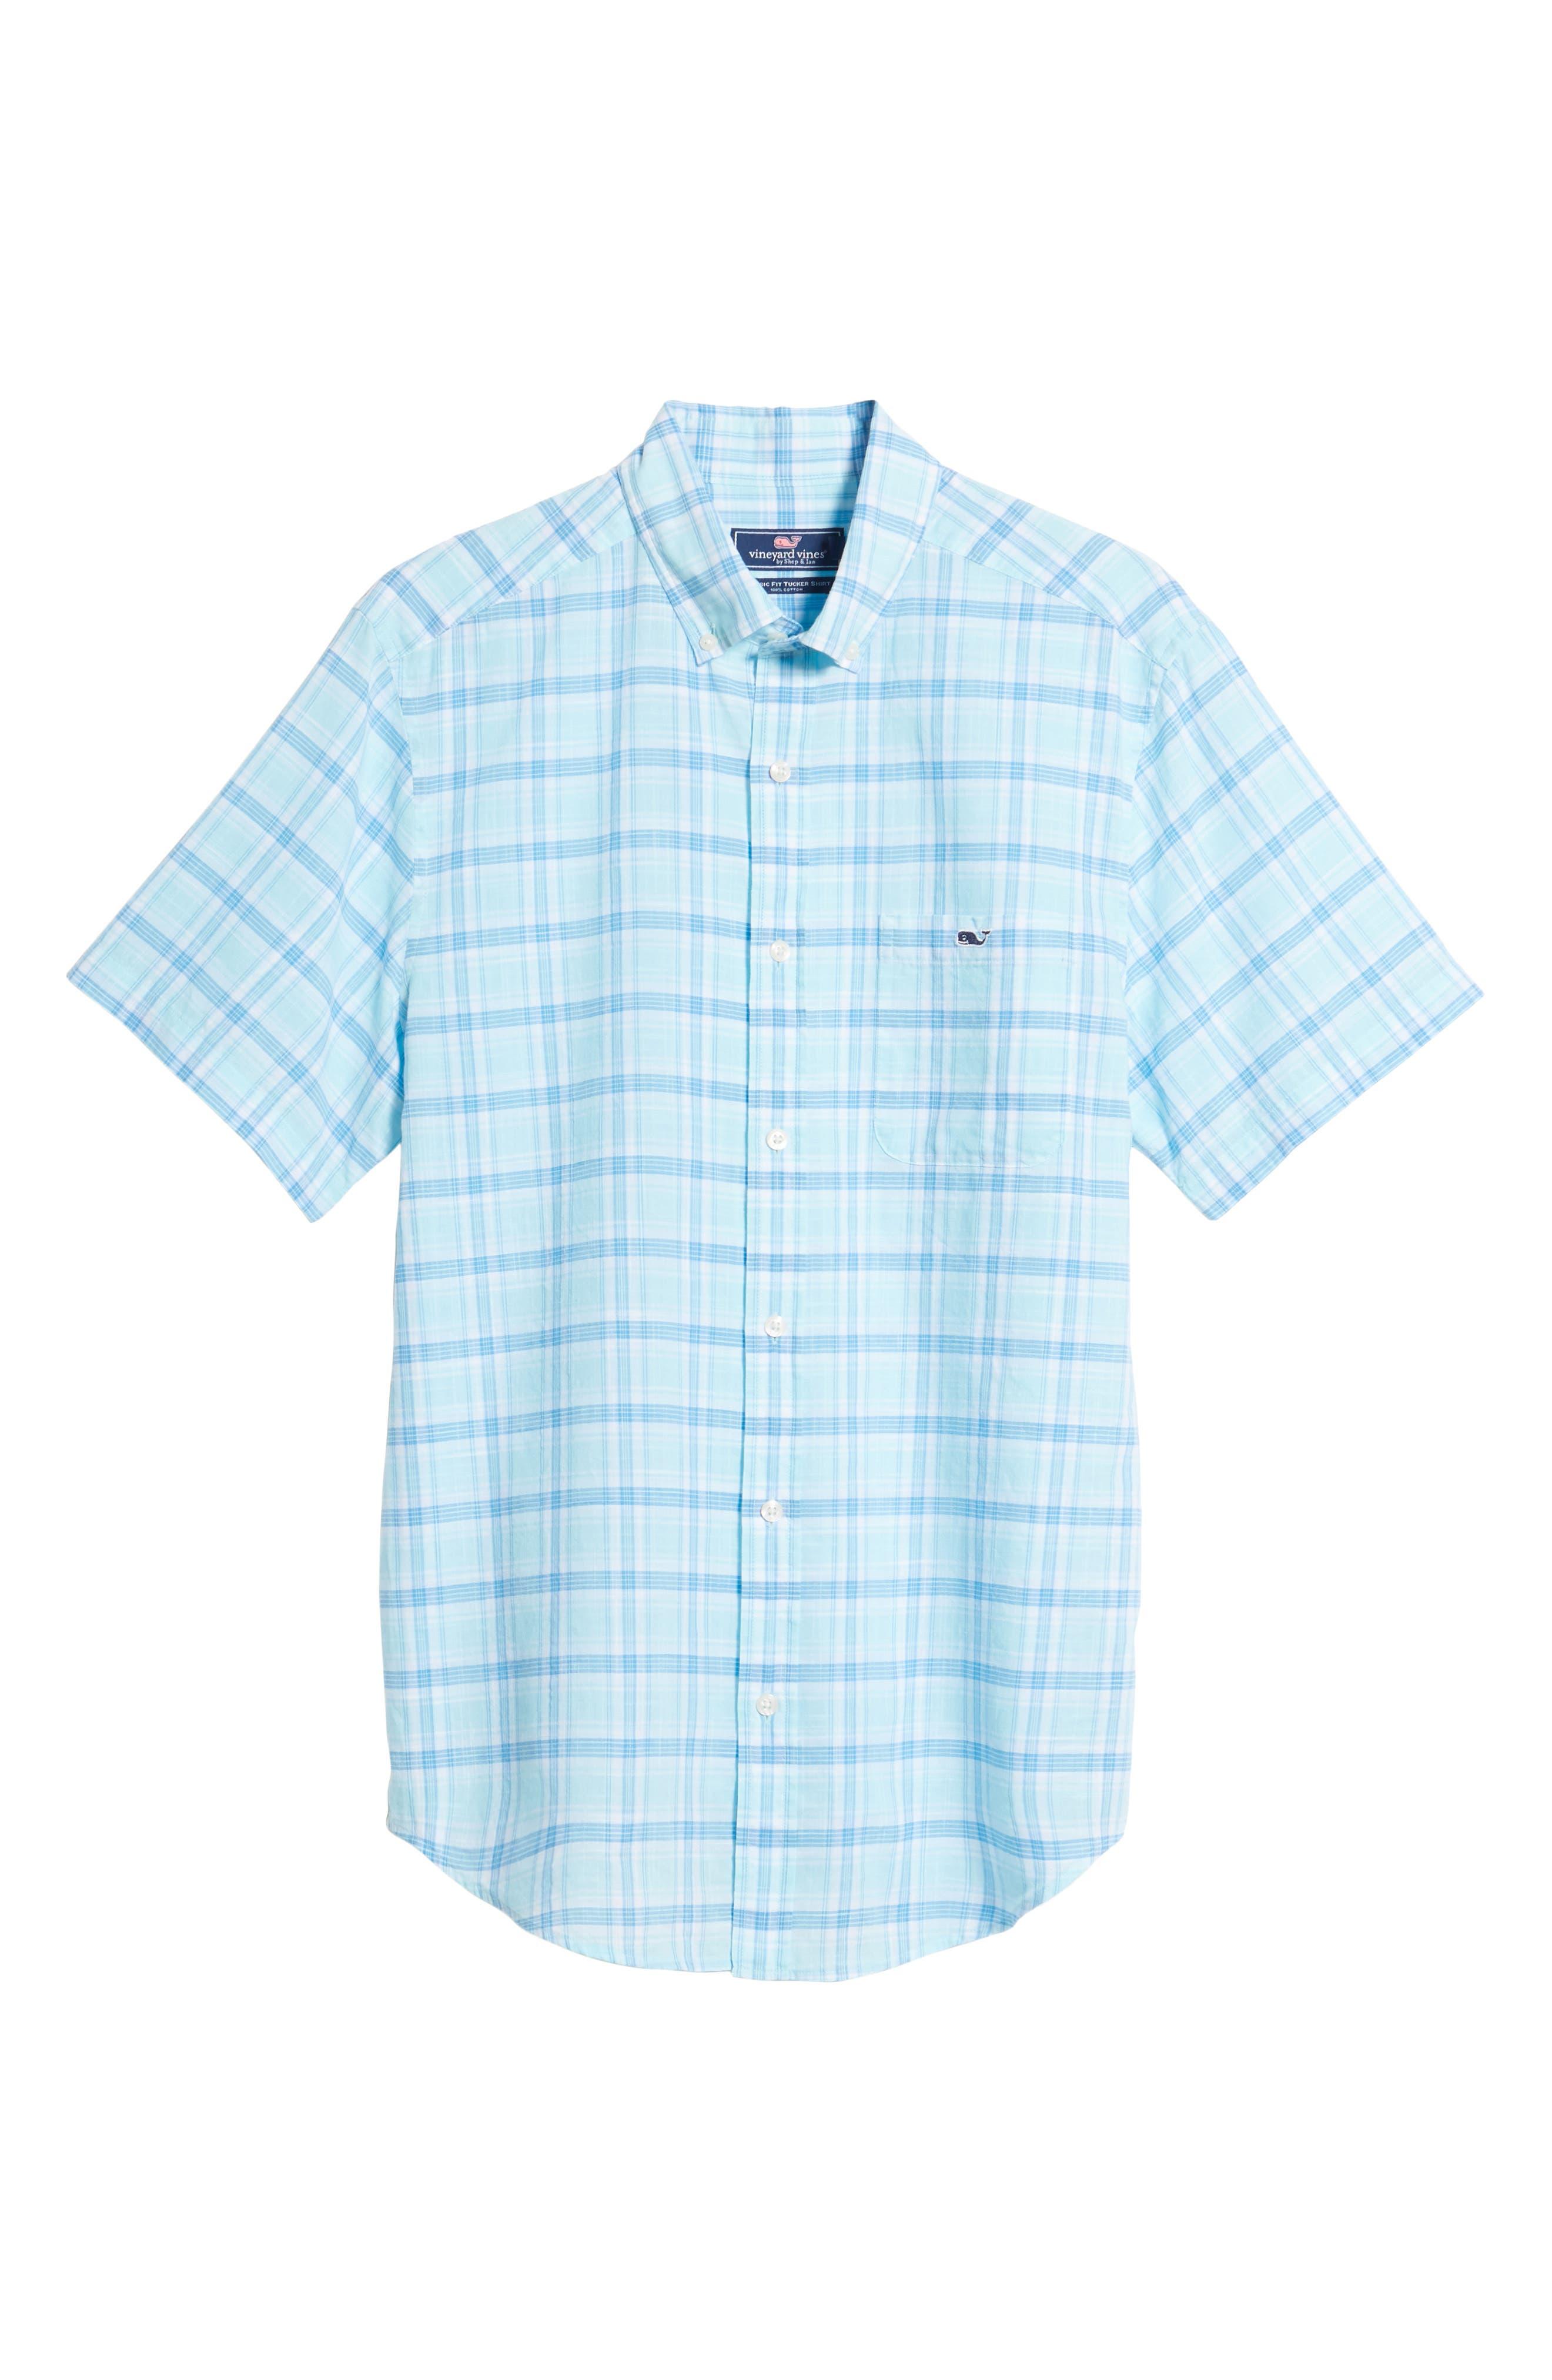 Pleasant Bay Classic Fit Plaid Sport Shirt,                             Alternate thumbnail 6, color,                             Pool Side